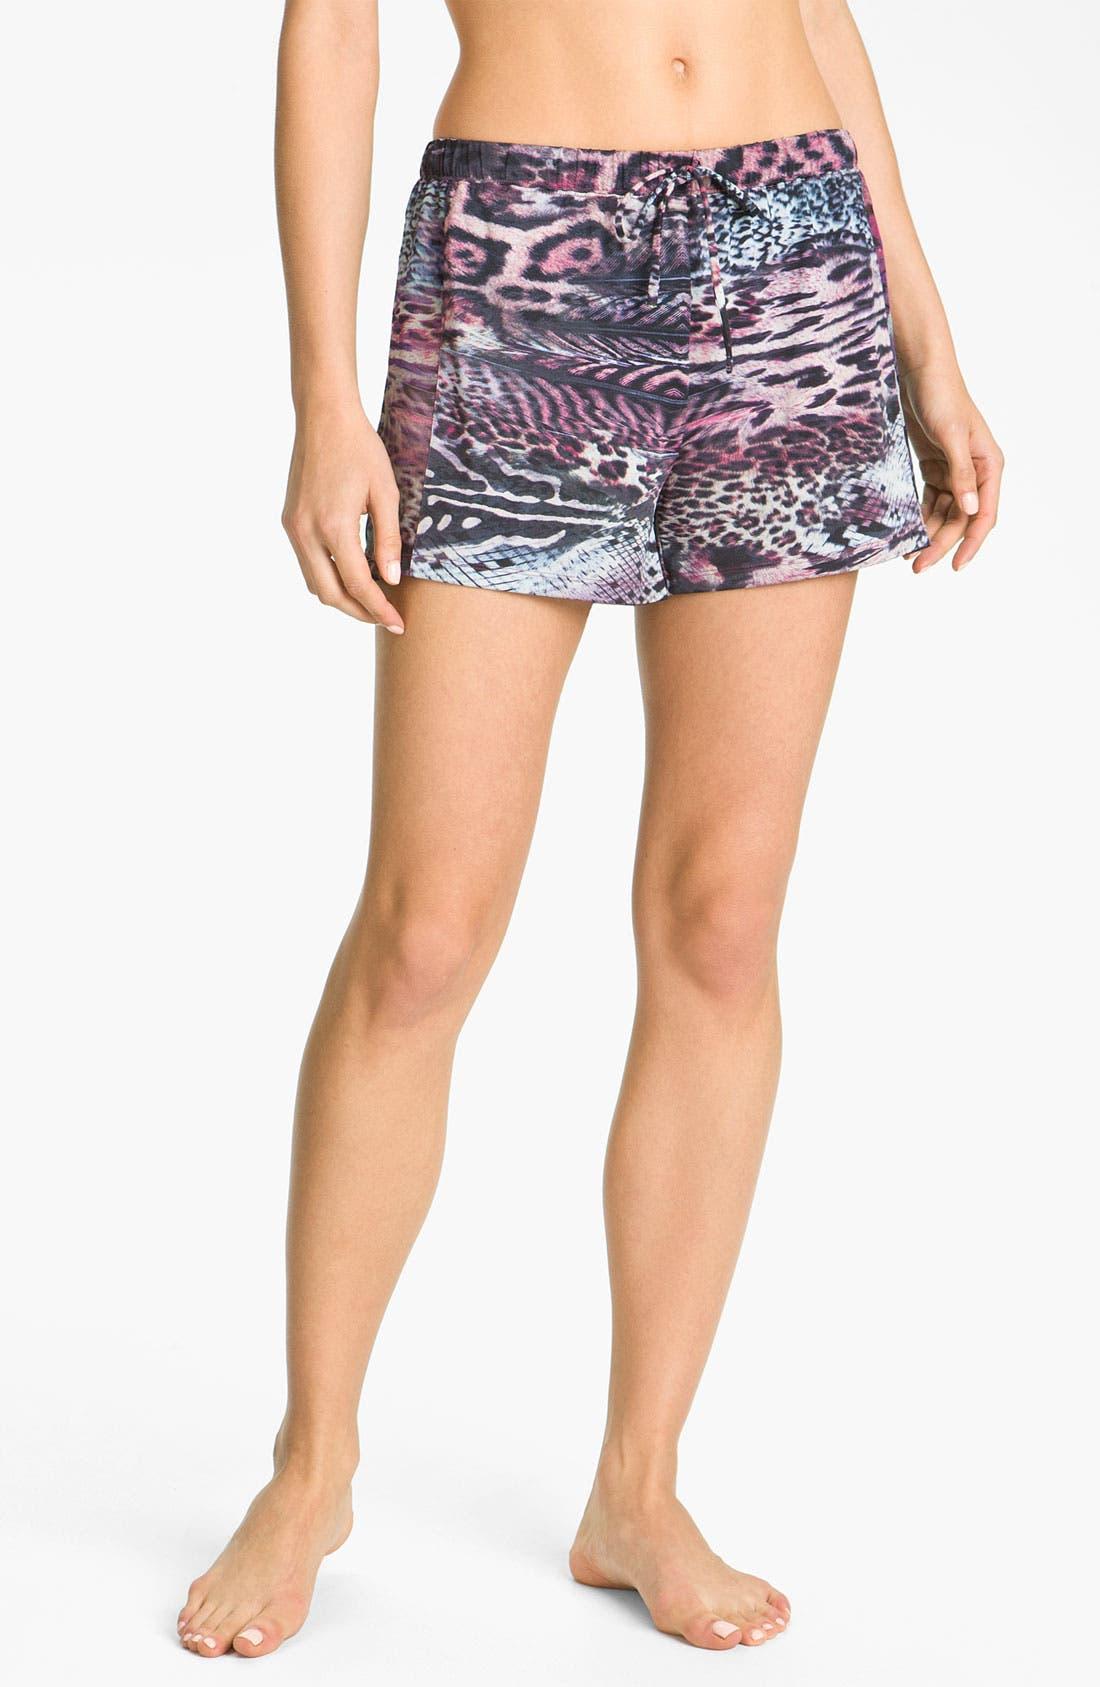 Alternate Image 1 Selected - Nicole Miller 'Wild Animal' Shorts